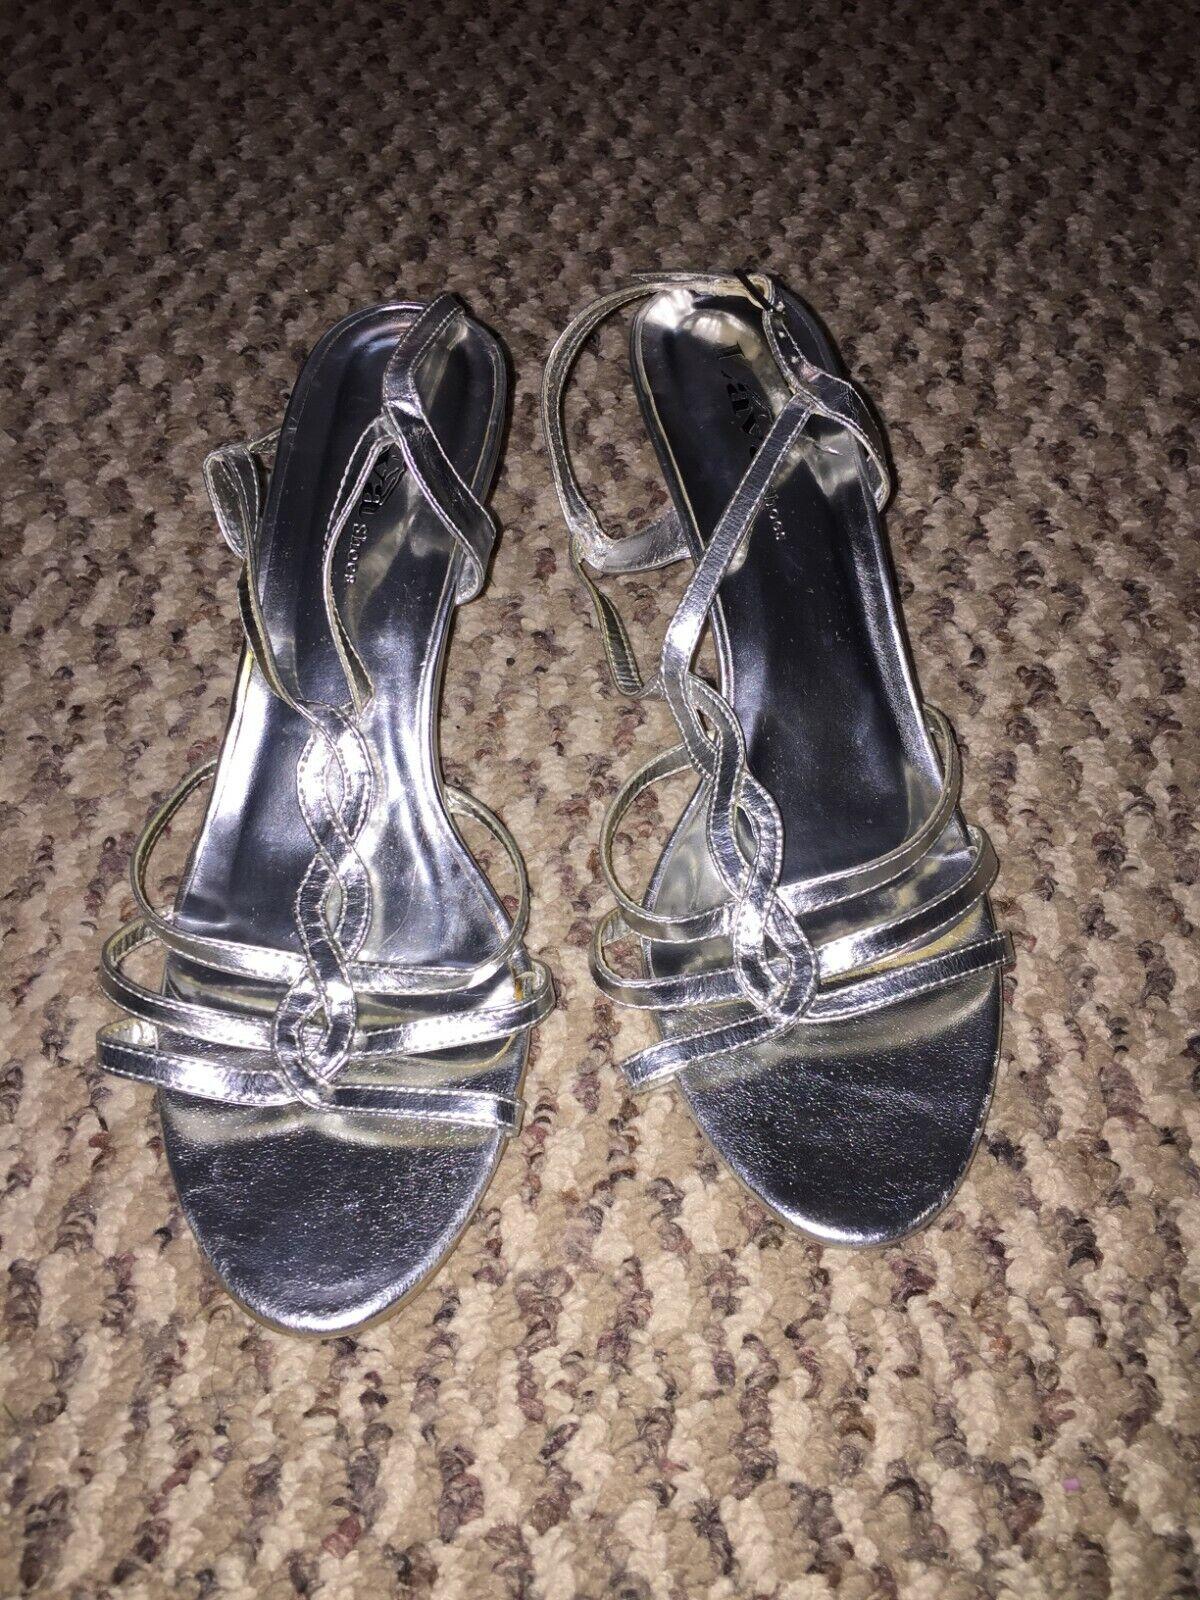 Lava Shoes Women's Silver Heels, Size 9 Style 4185 FAITH